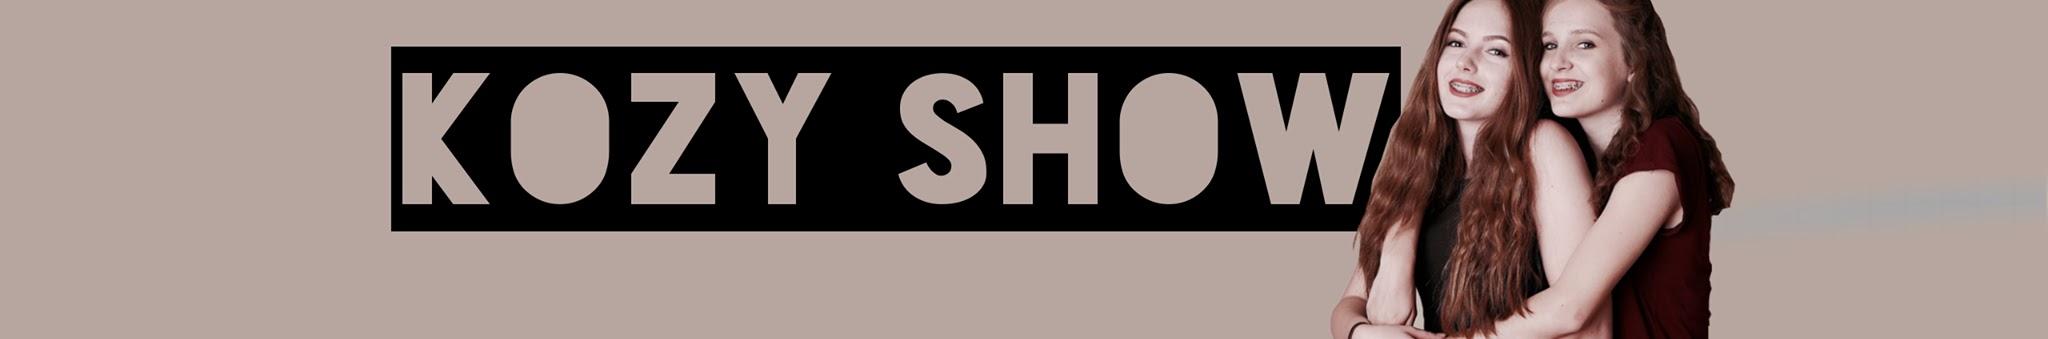 Kozy Show